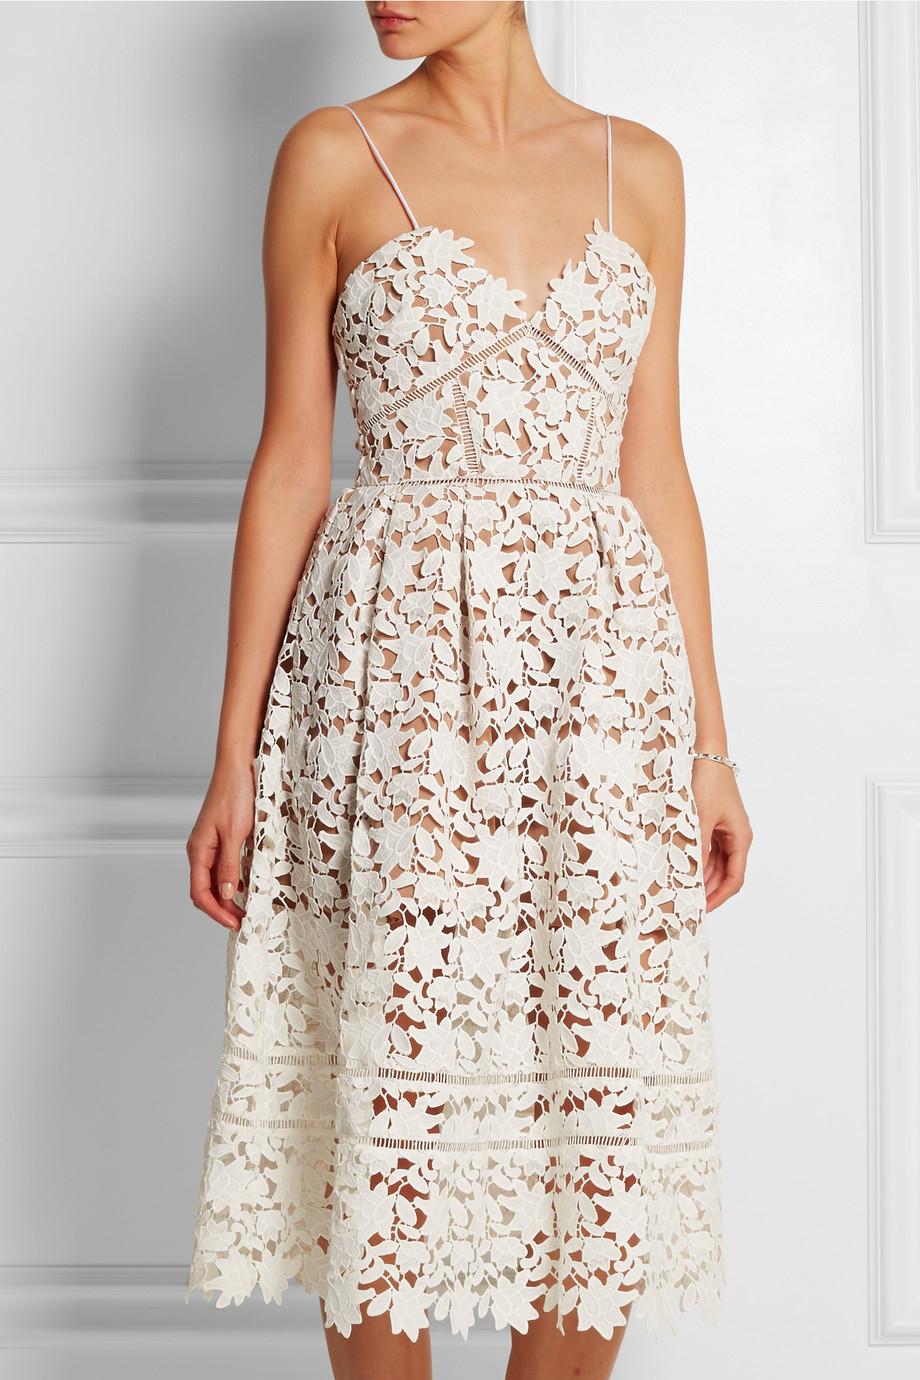 a226e87b7a54ea Self-Portrait Azaelea Floral-Lace Dress in White - Lyst